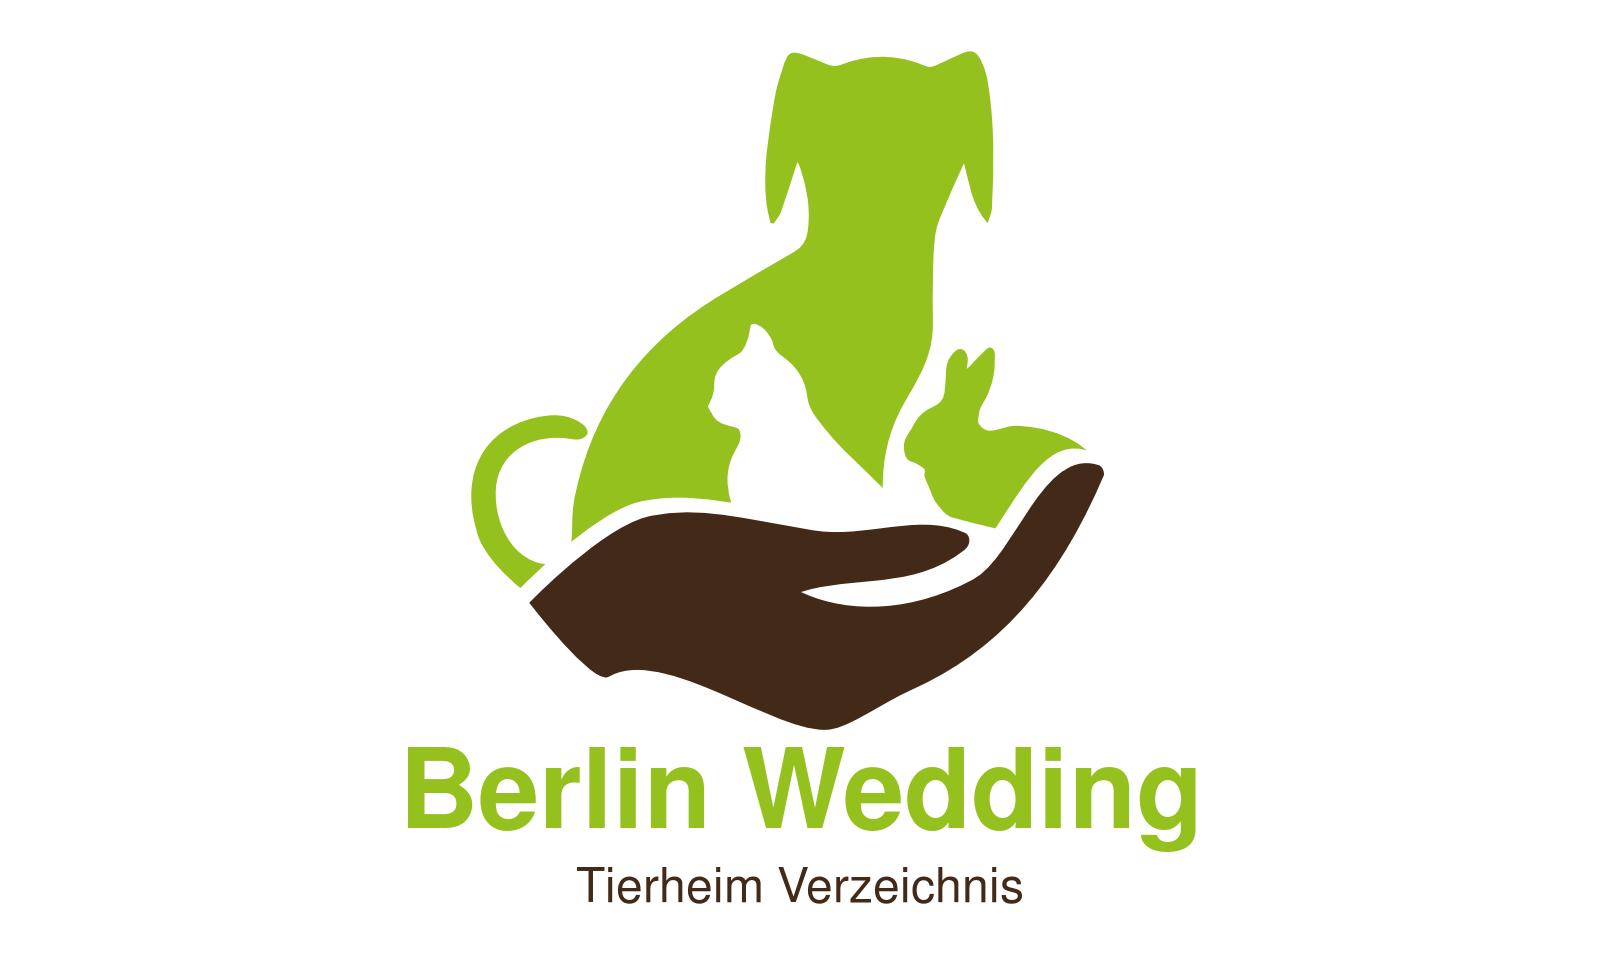 Tierheim Berlin Wedding